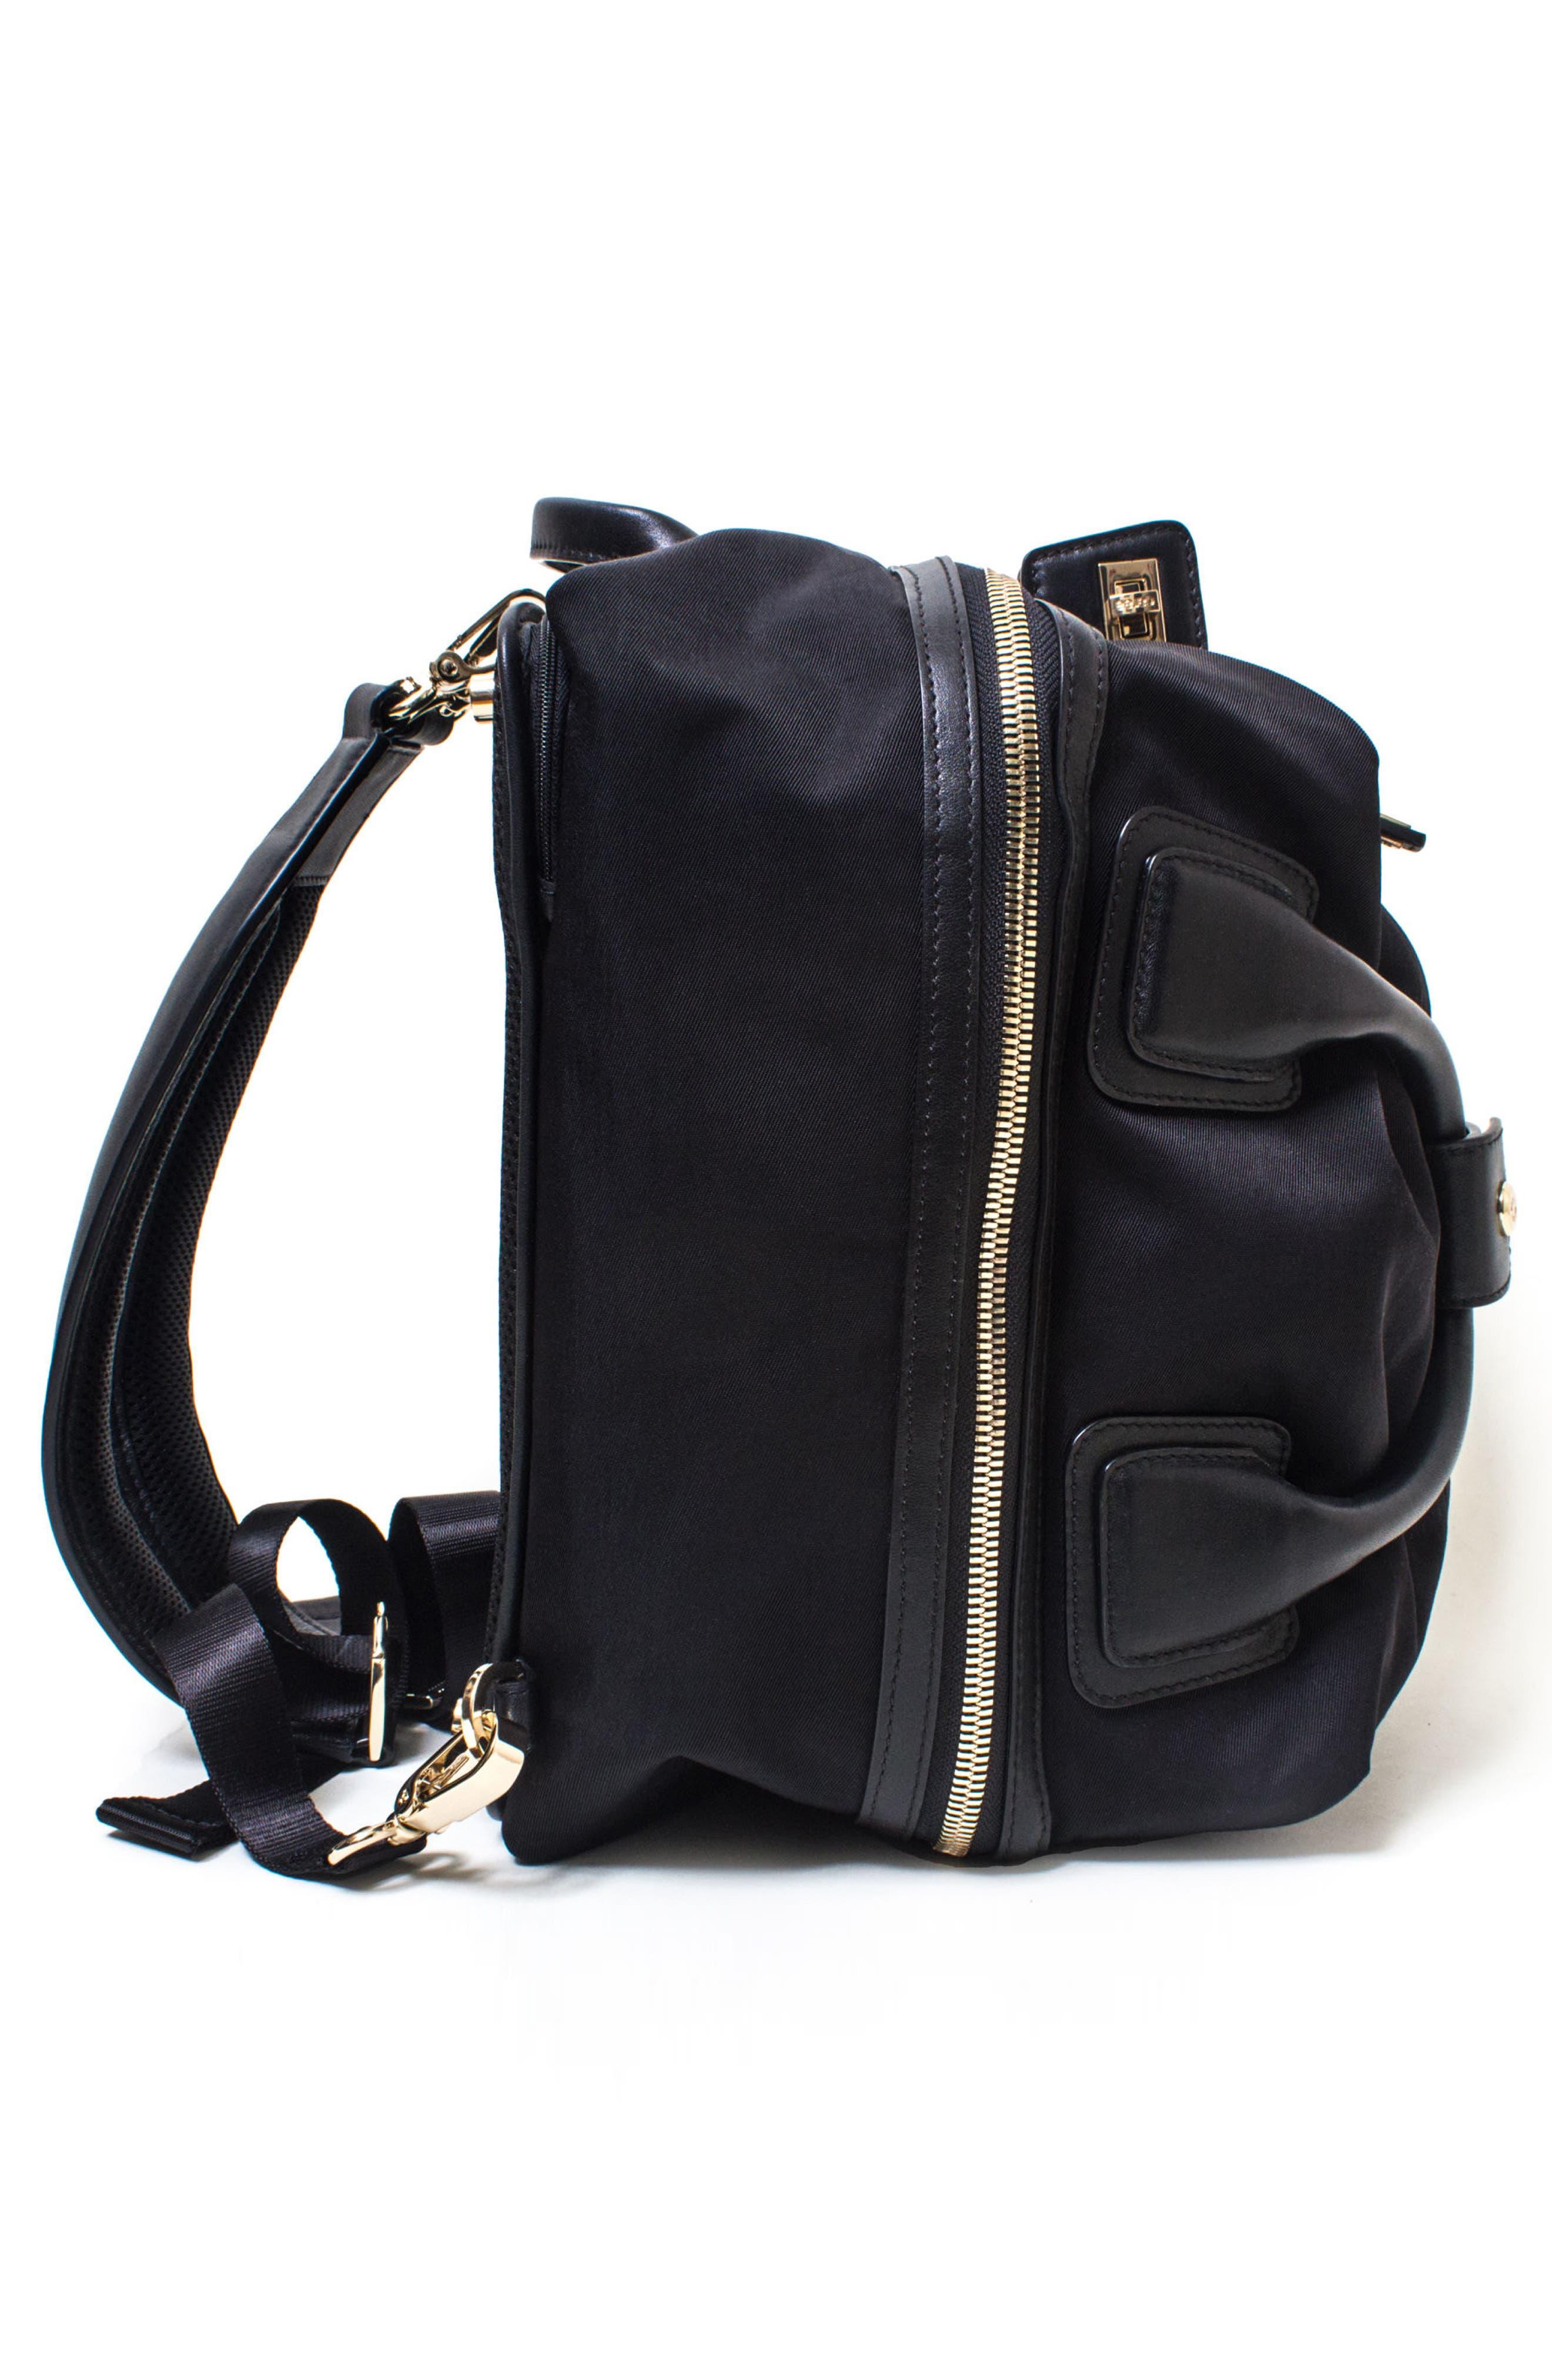 Studio Duffel Backpack,                             Alternate thumbnail 7, color,                             BLACK/ GOLD